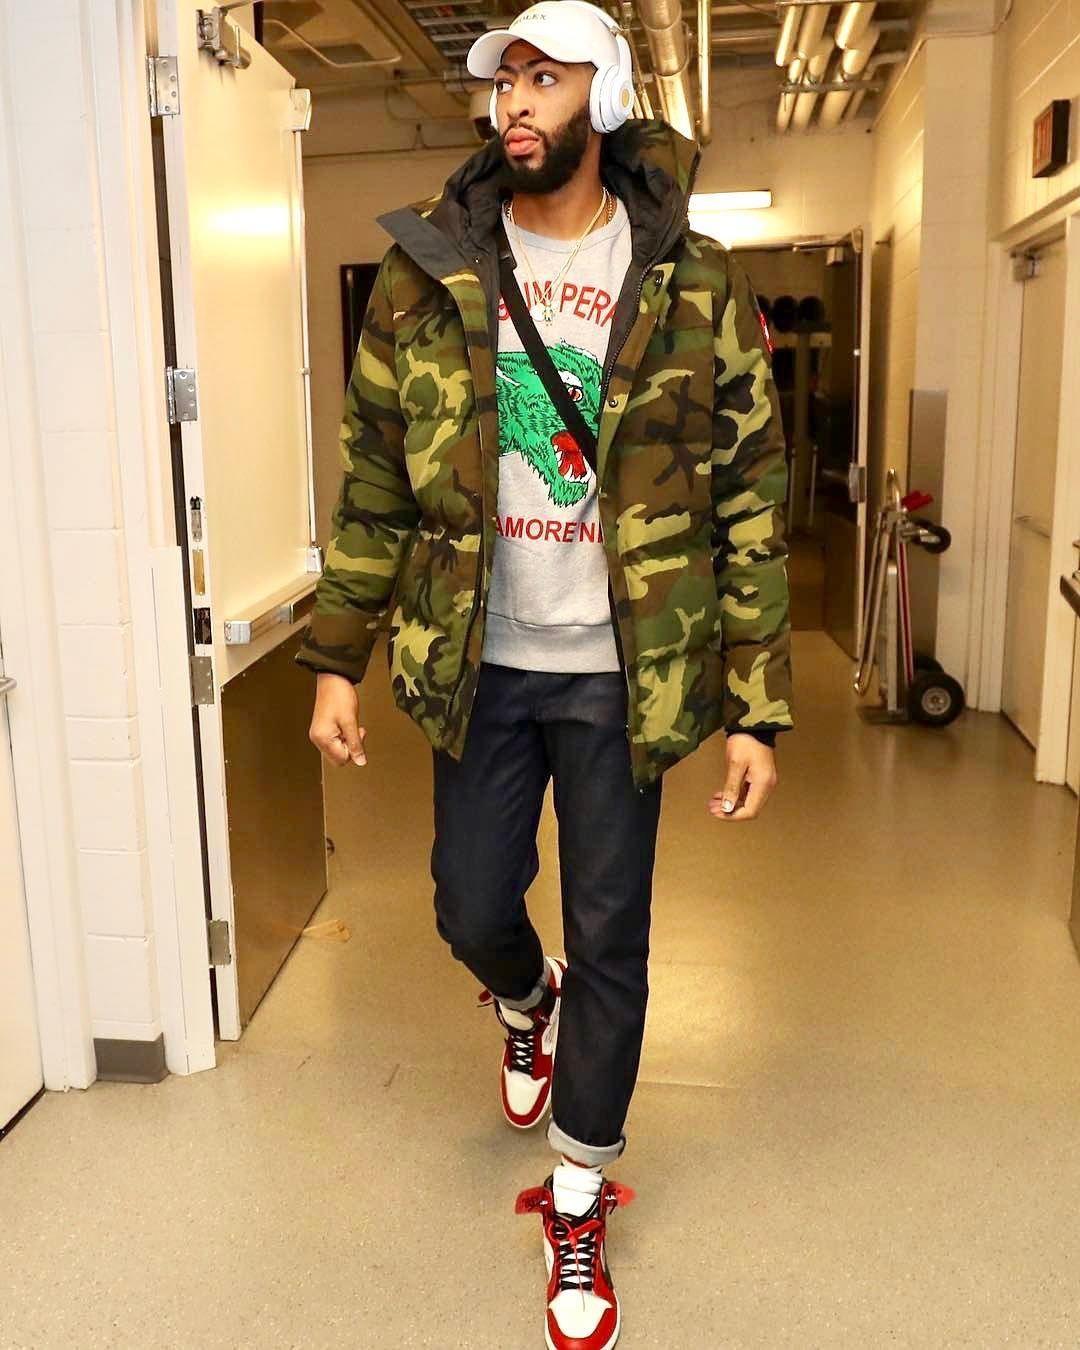 info for f0ec5 a7227 NBA Style Anthony Davis  fashion  nbastyle  ootd  nba  style  styles   streetstyle  streetwear  streetfashion  fashioninspo  styleinspiration   inspo  urban ...